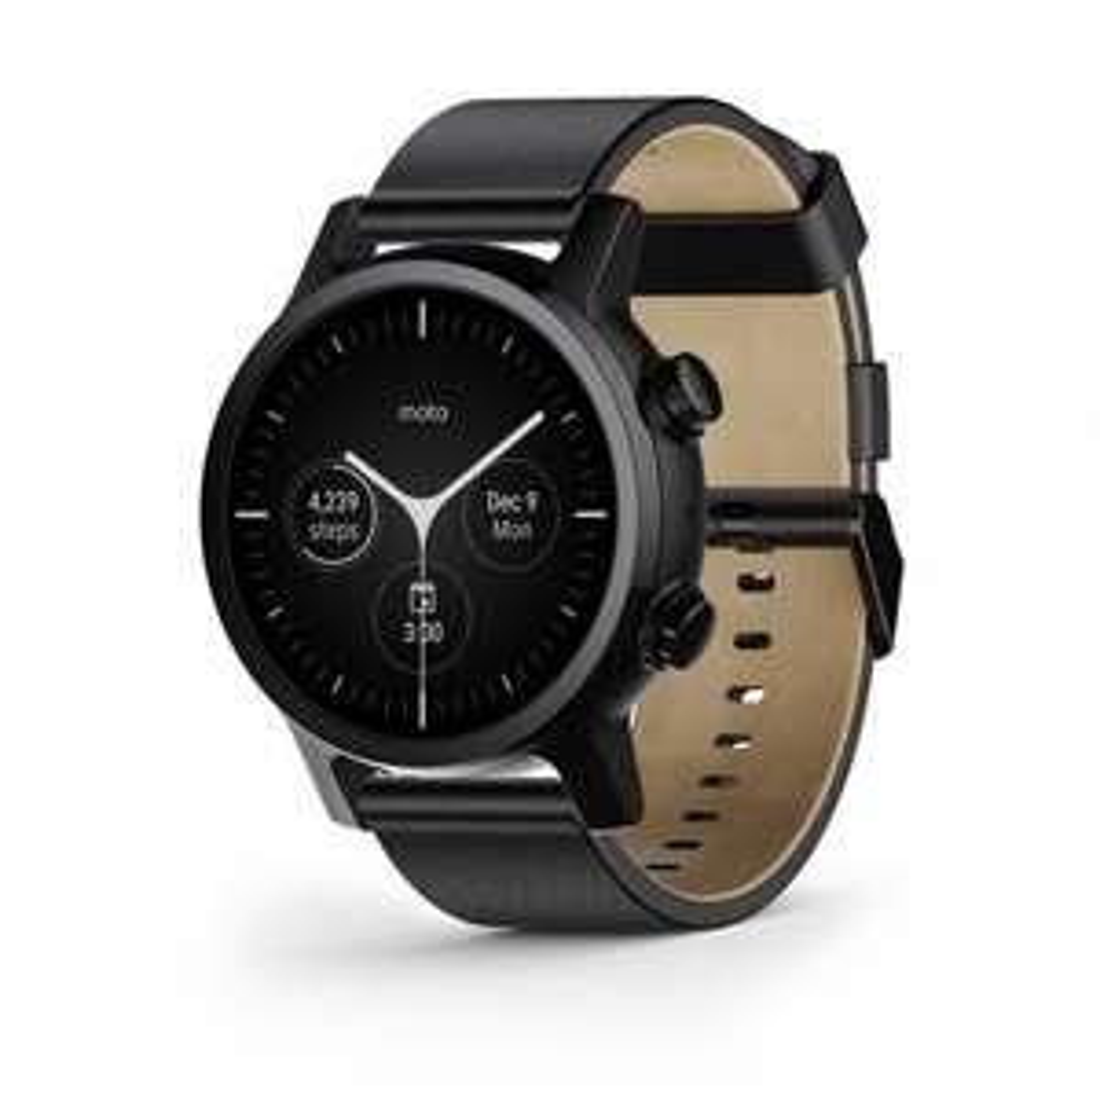 Moto 360 smartwatch 3rd gen £179.99 @ Moto360